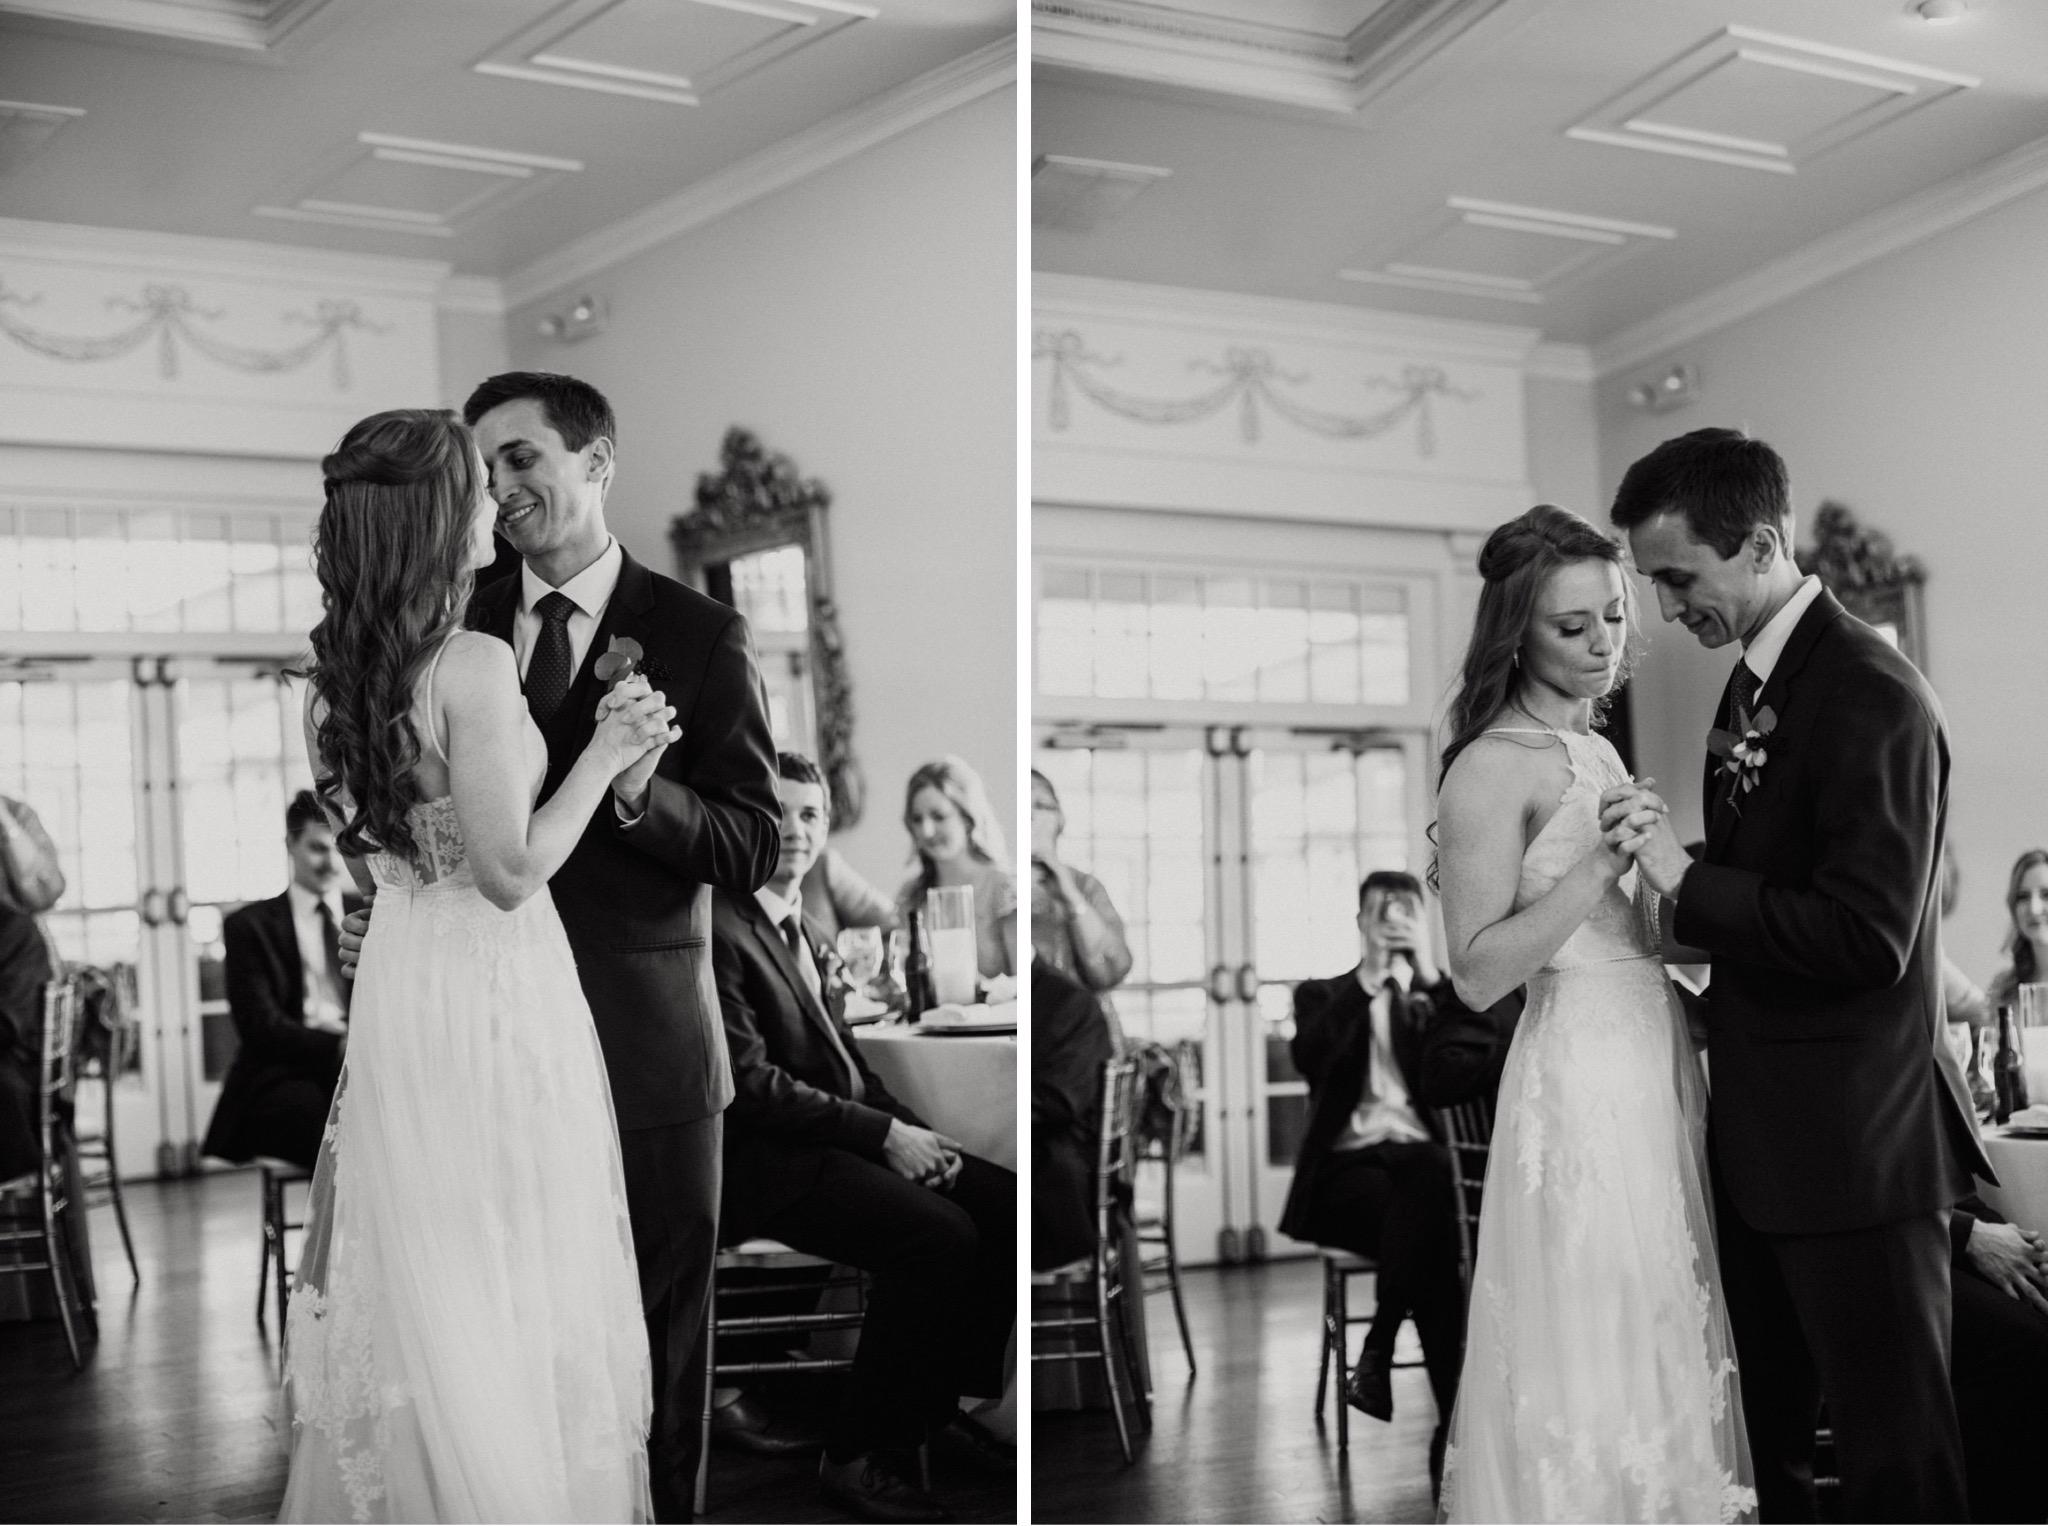 75_West Manor Estate Weddings - Pat Cori Photography-158_West Manor Estate Weddings - Pat Cori Photography-159_VirginiaWeddingPhotographer_WestManorEstate_Firstdance_Wedding.jpg